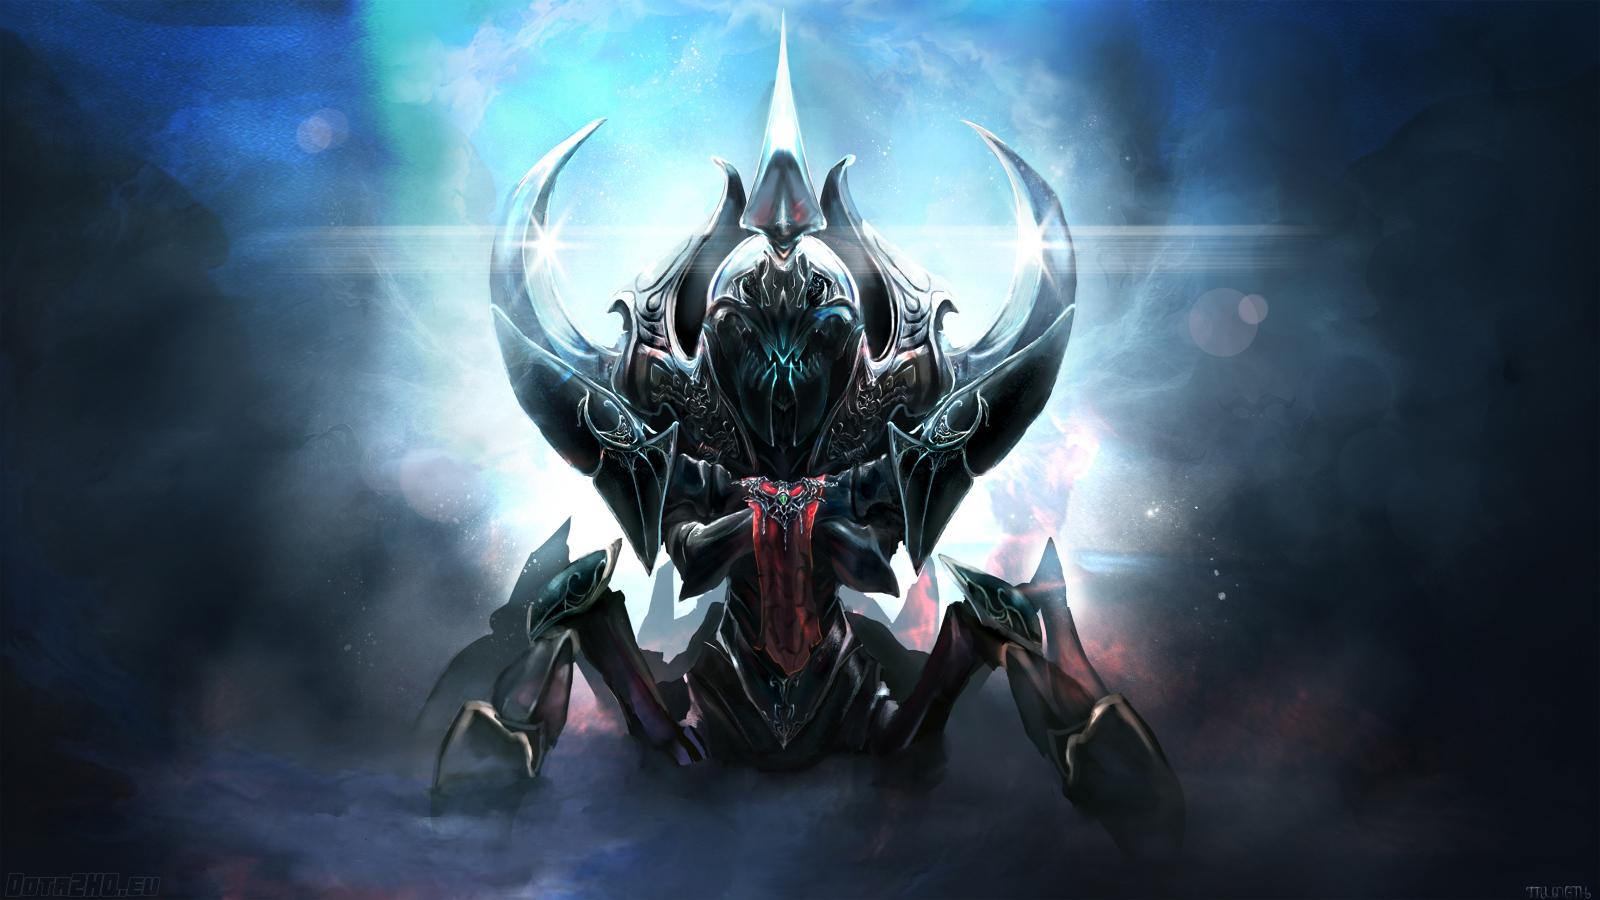 nyx_assassin_dota_2_the_sudden_death_killer_94255_1600x900